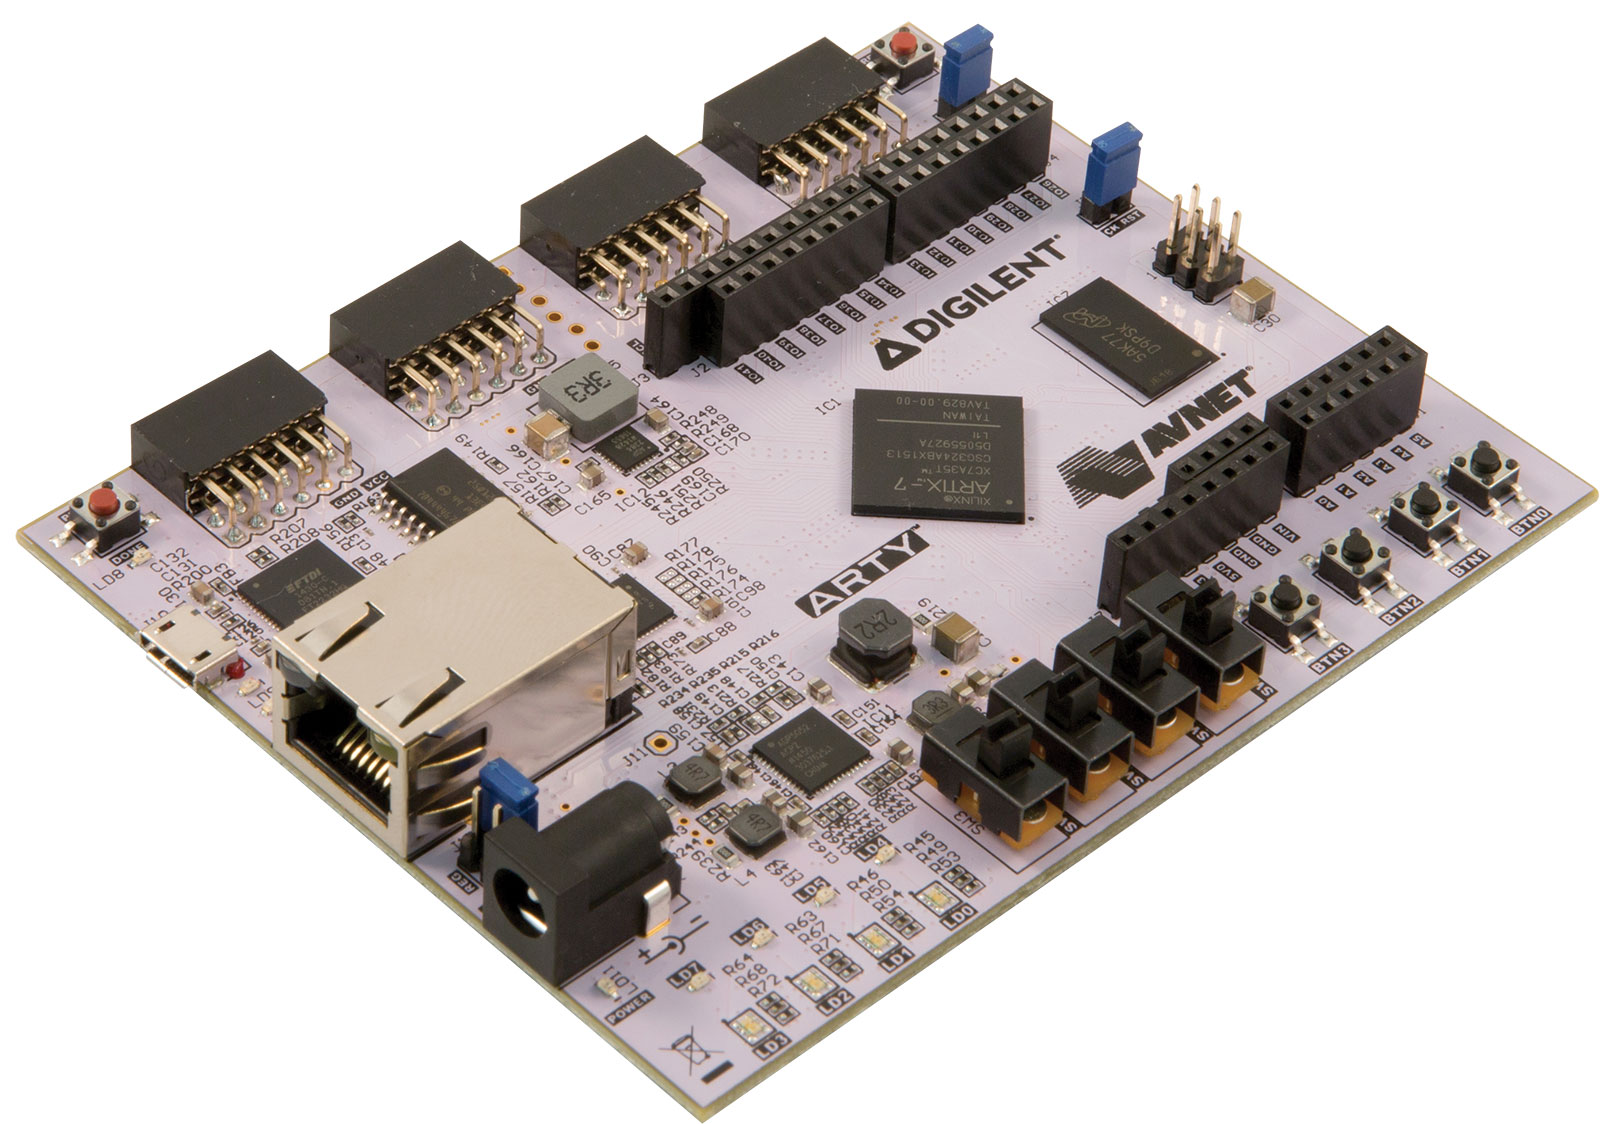 Arty Artix-7 35T FPGA Evaluation Kit | Trenz Electronic GmbH